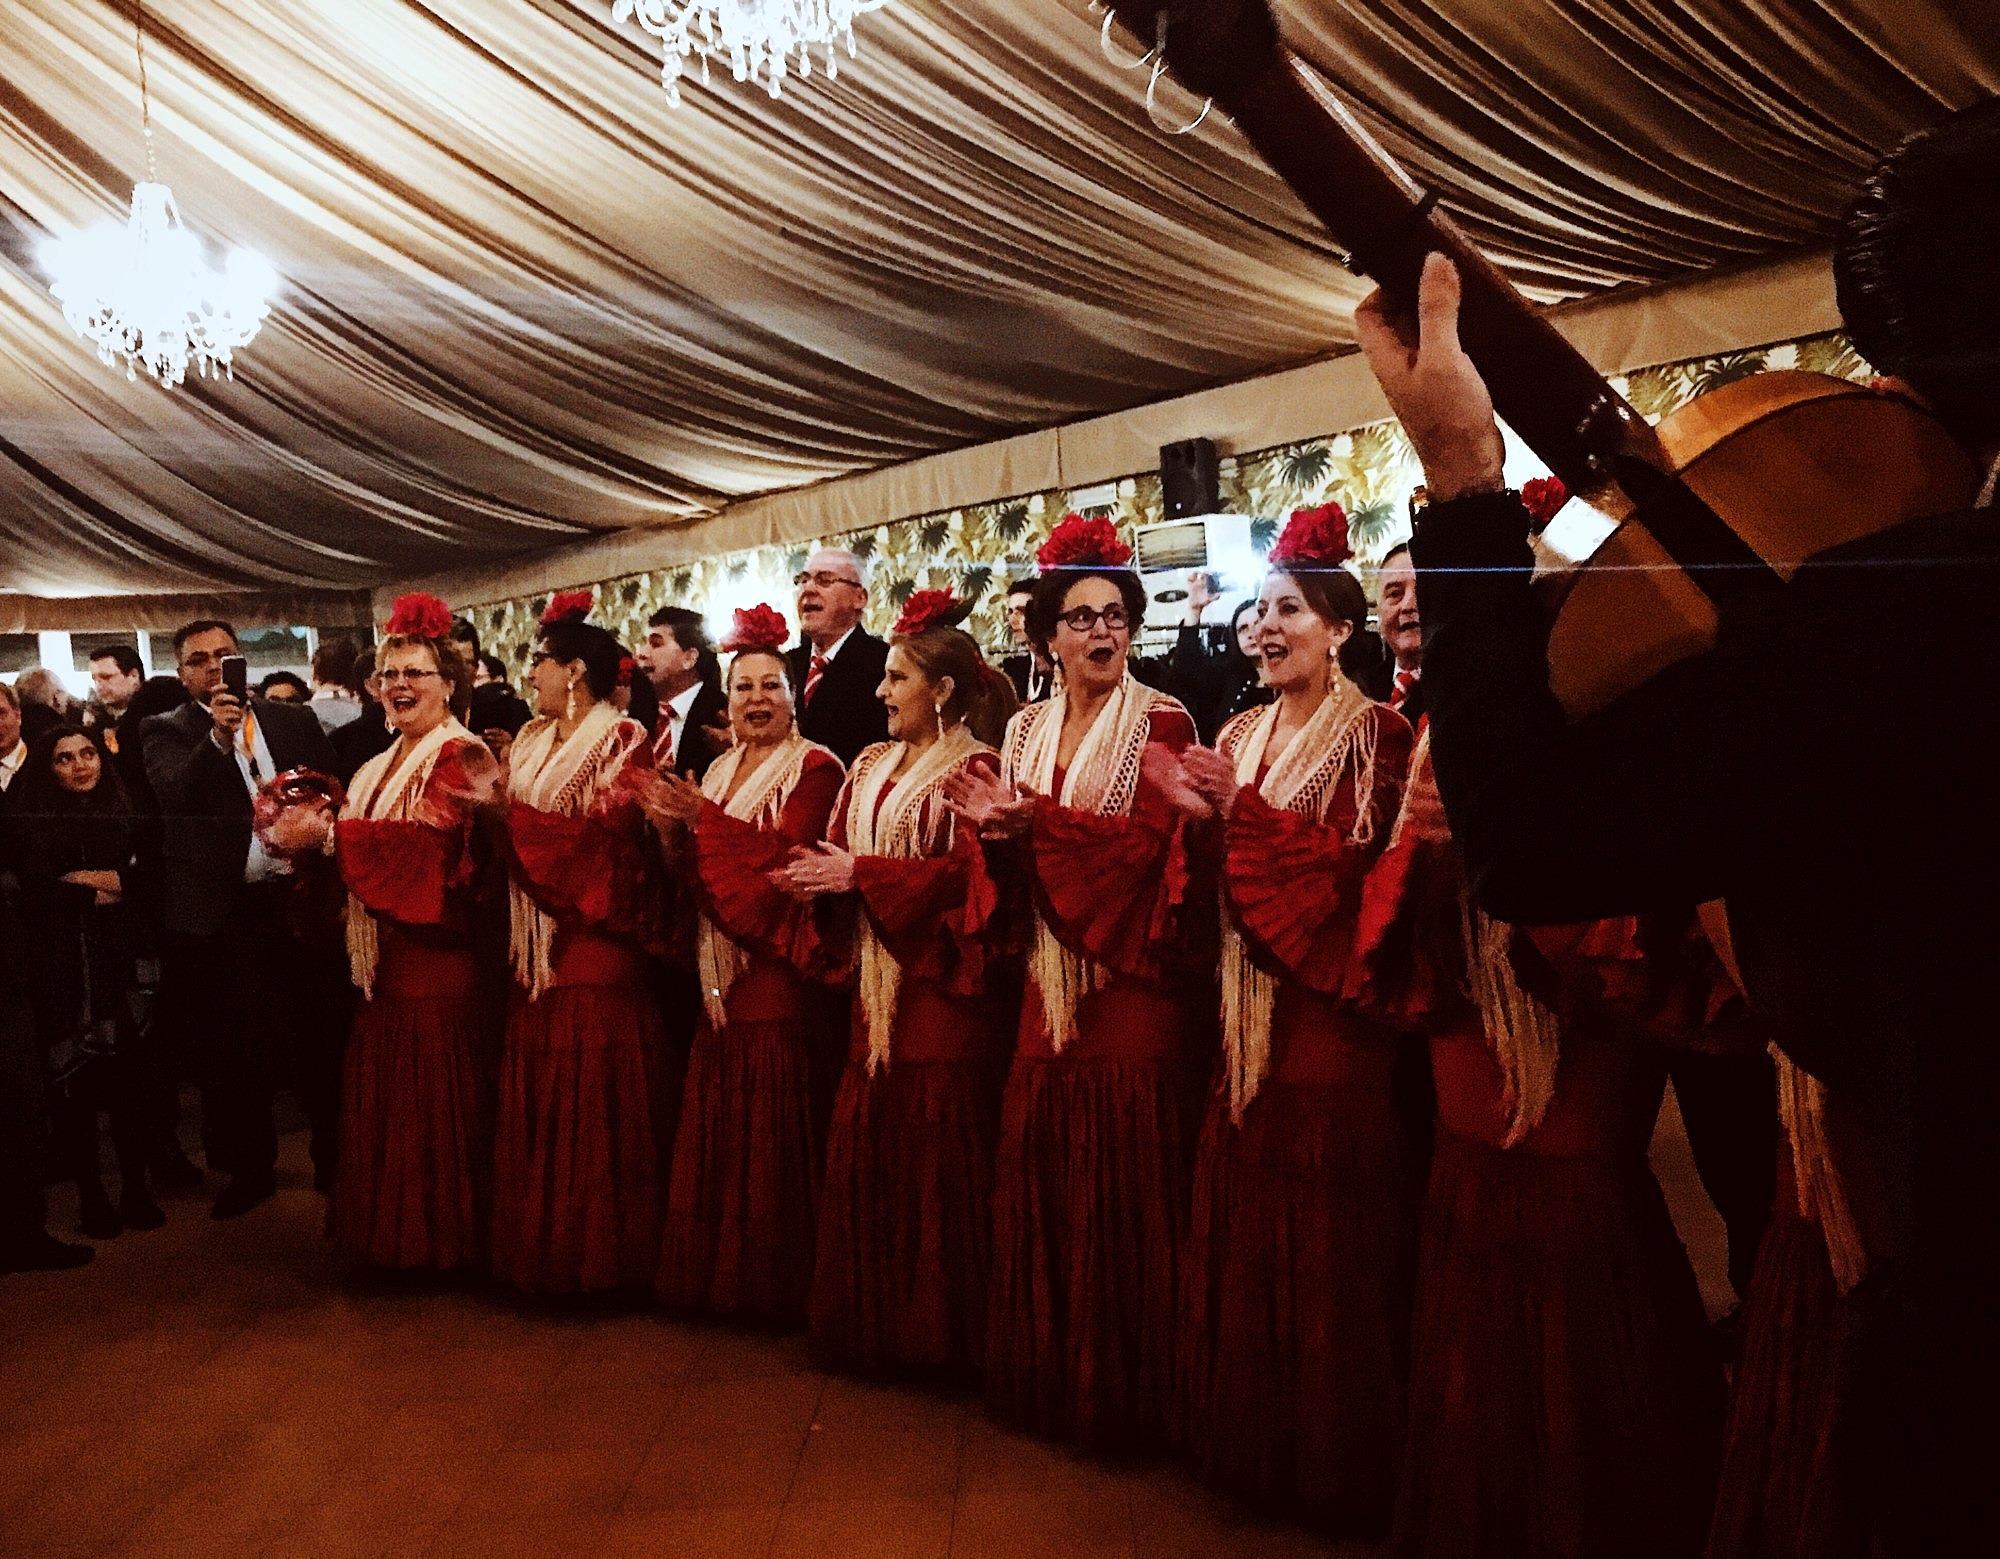 Flamenco dancers at the gala dinner